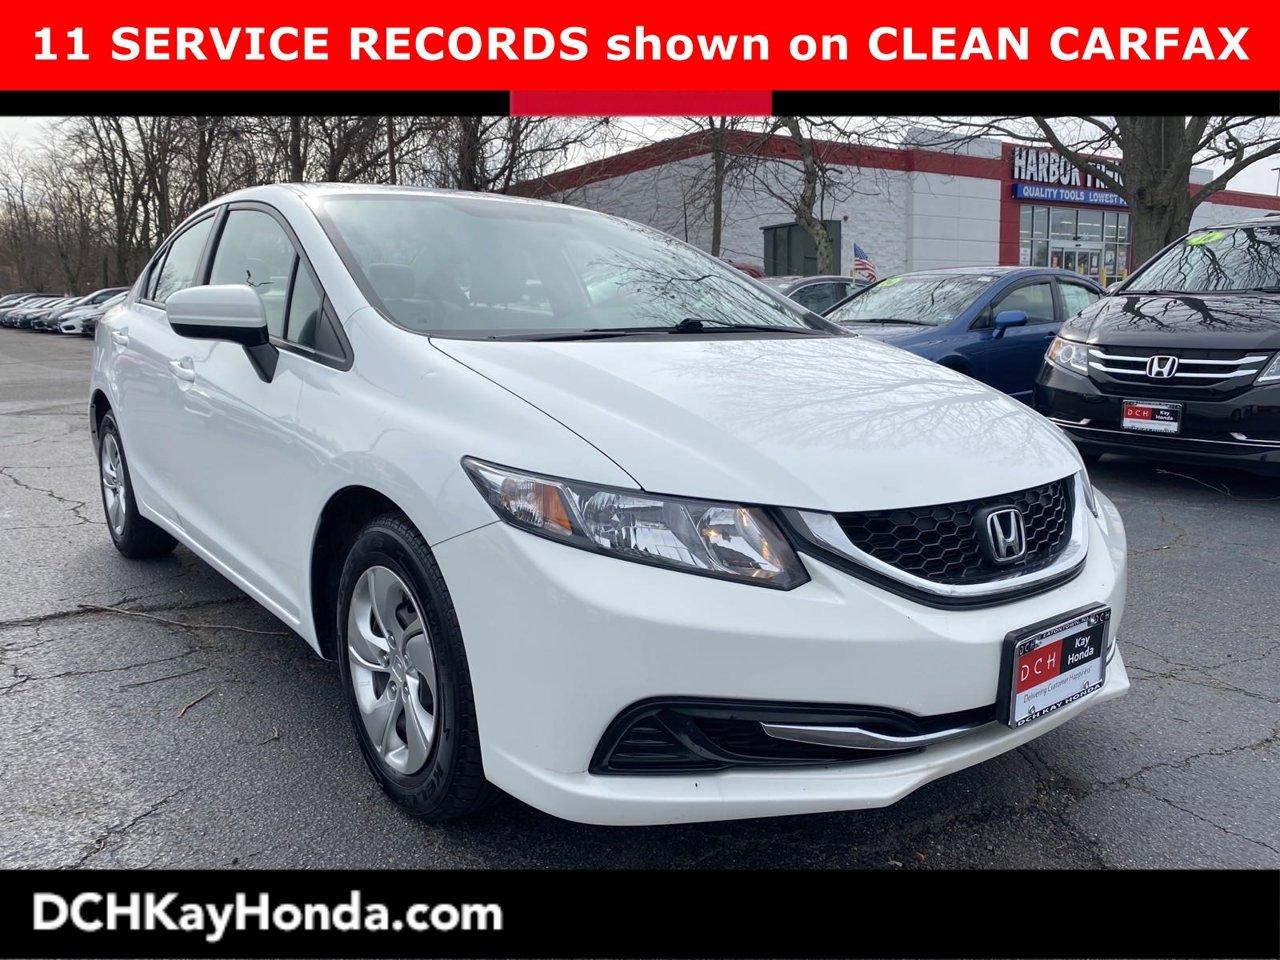 Used 2015 Honda Civic Sedan in Eatontown, NJ